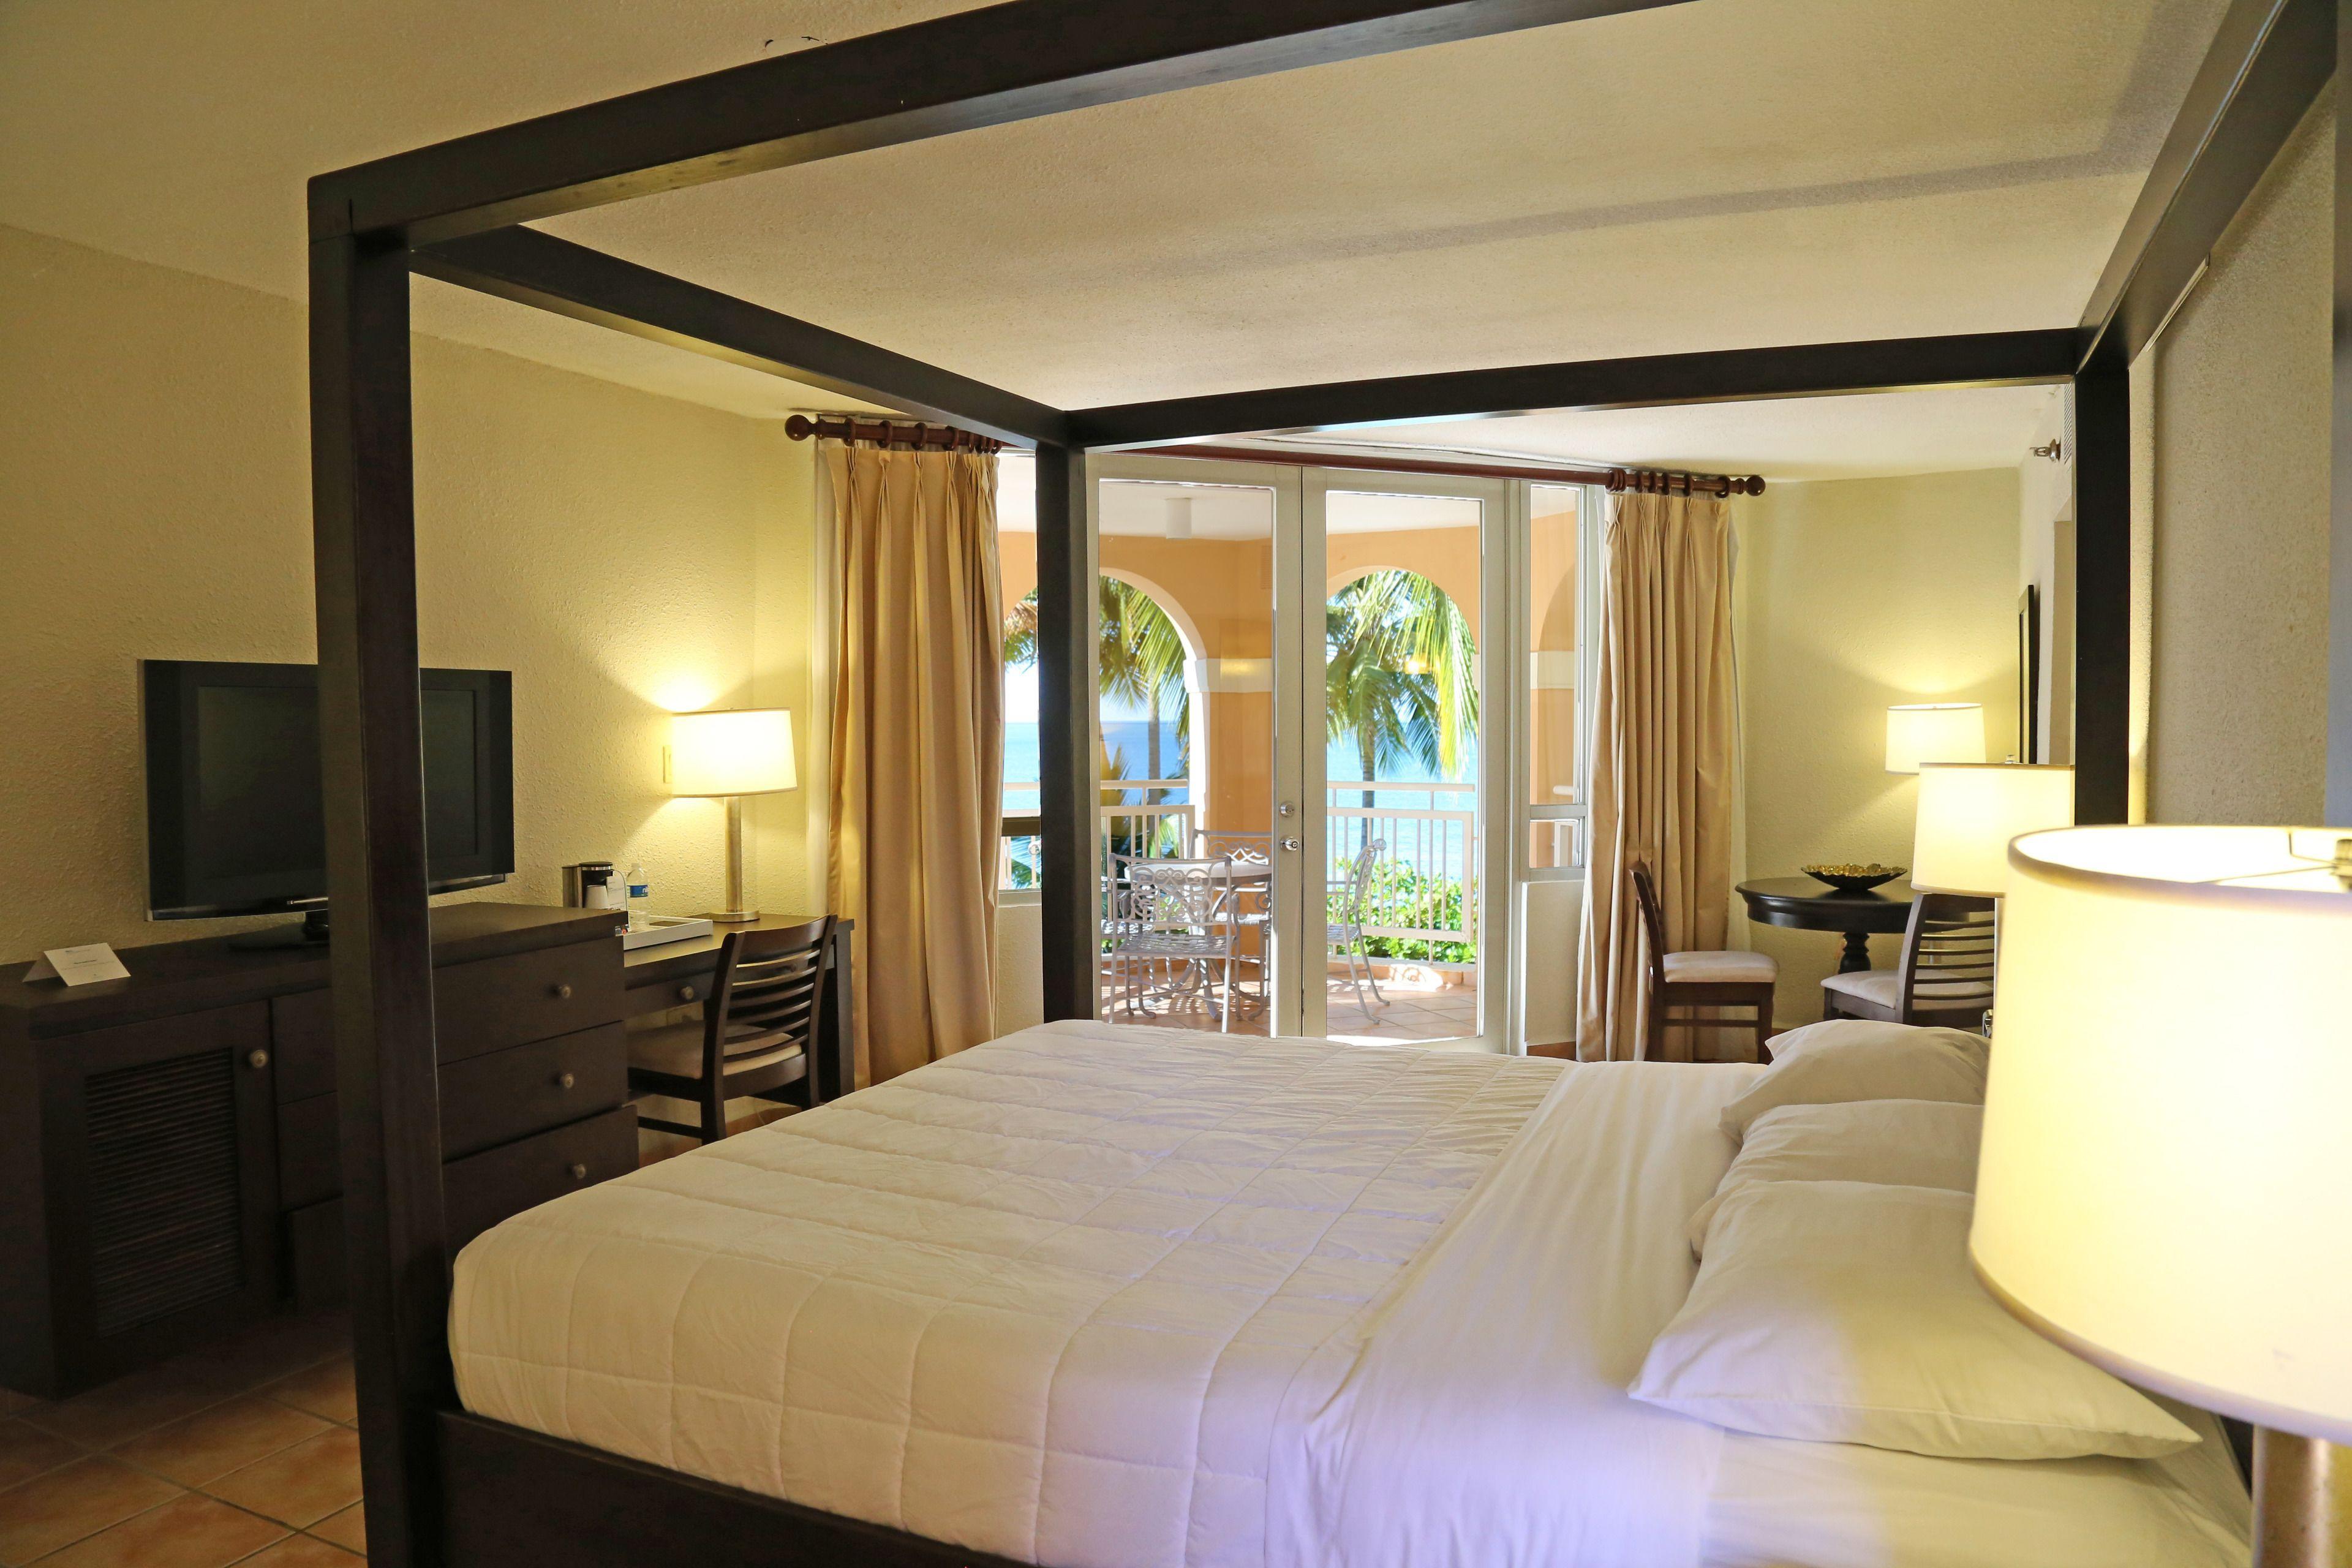 Courtesy of Rincon Beach Resort / Expedia